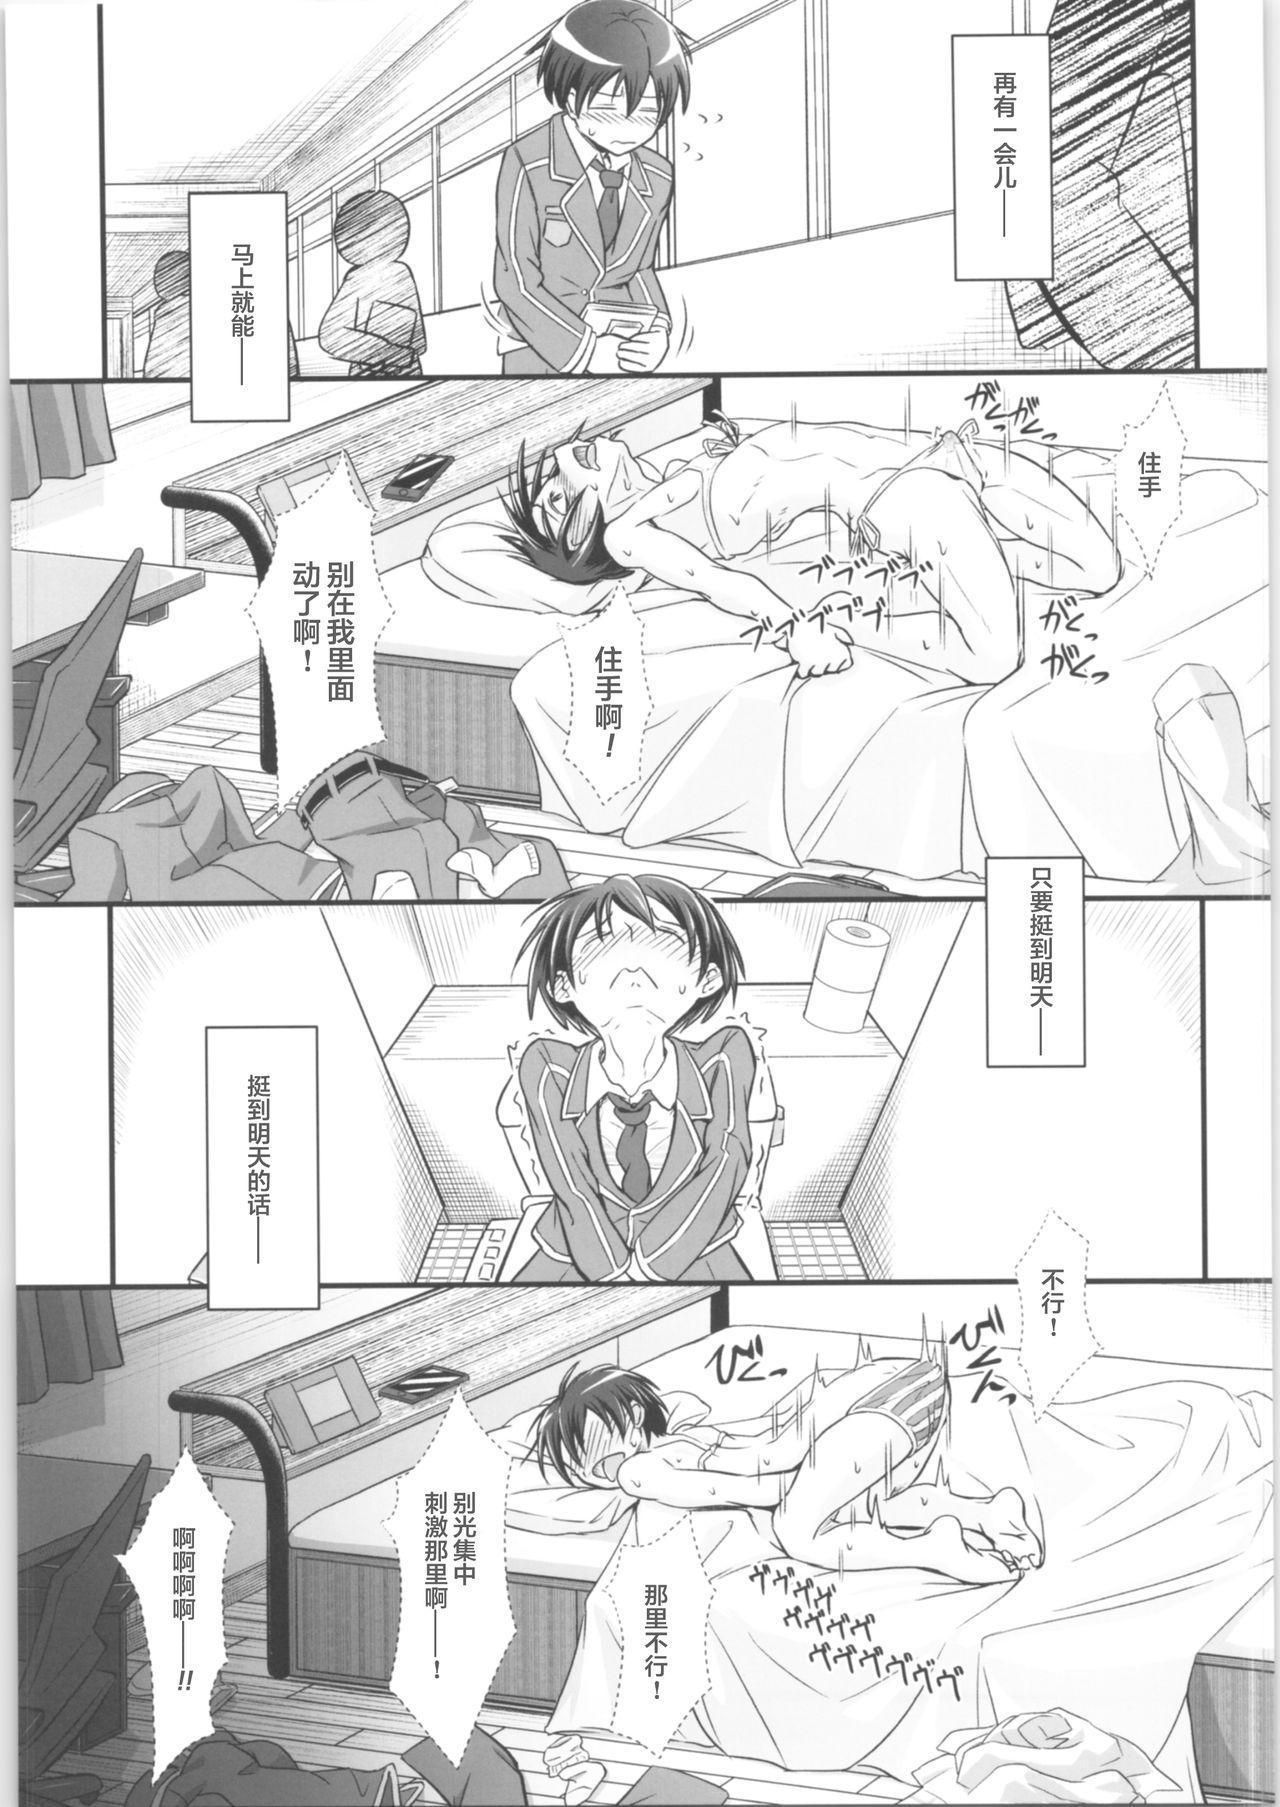 [Umari-ya (D-2)] Kiriko Route Another #02 ~Shitagi Josou Jii Kyouyou Hen~ (Sword Art Online)[Chinese]【不可视汉化】 20